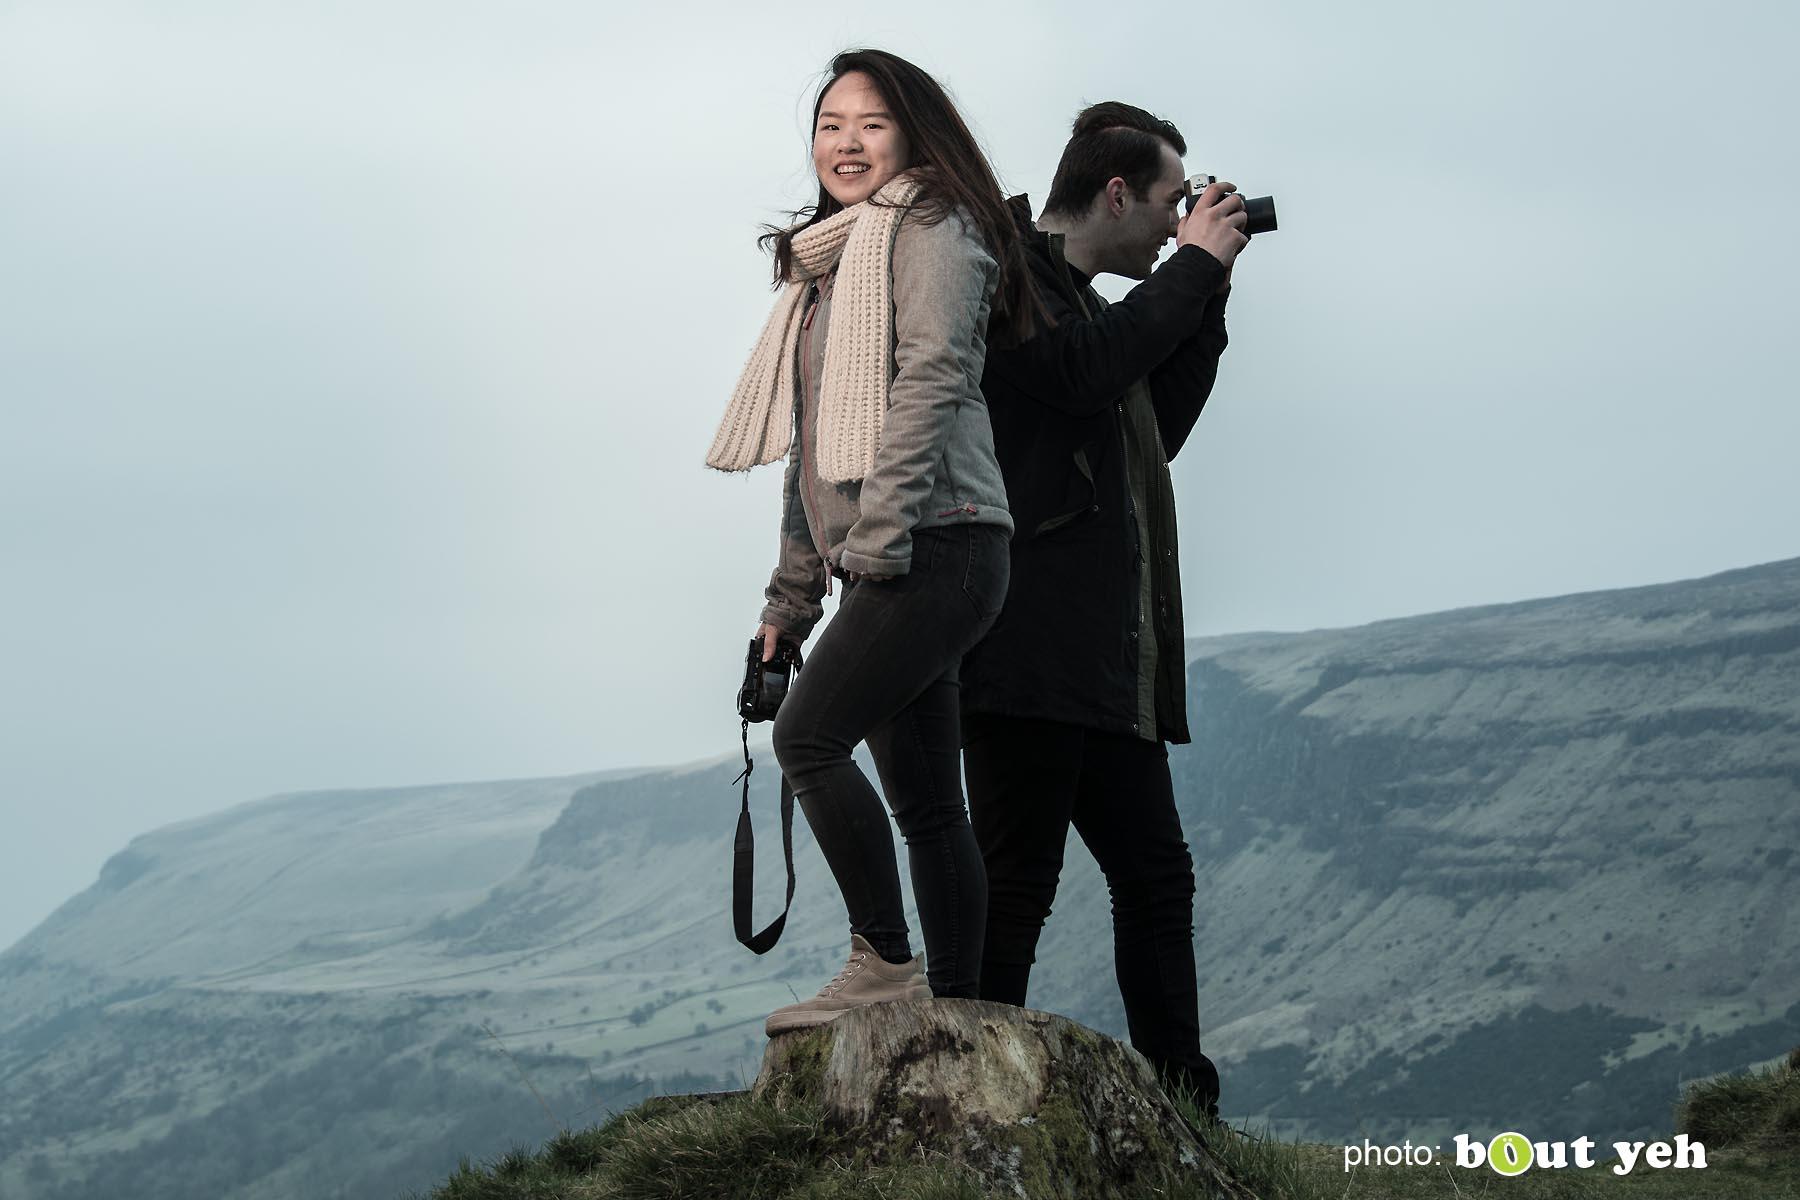 Maikel and Mai-Lin, Glenariff Forest, Northern Ireland. Photo 0647.